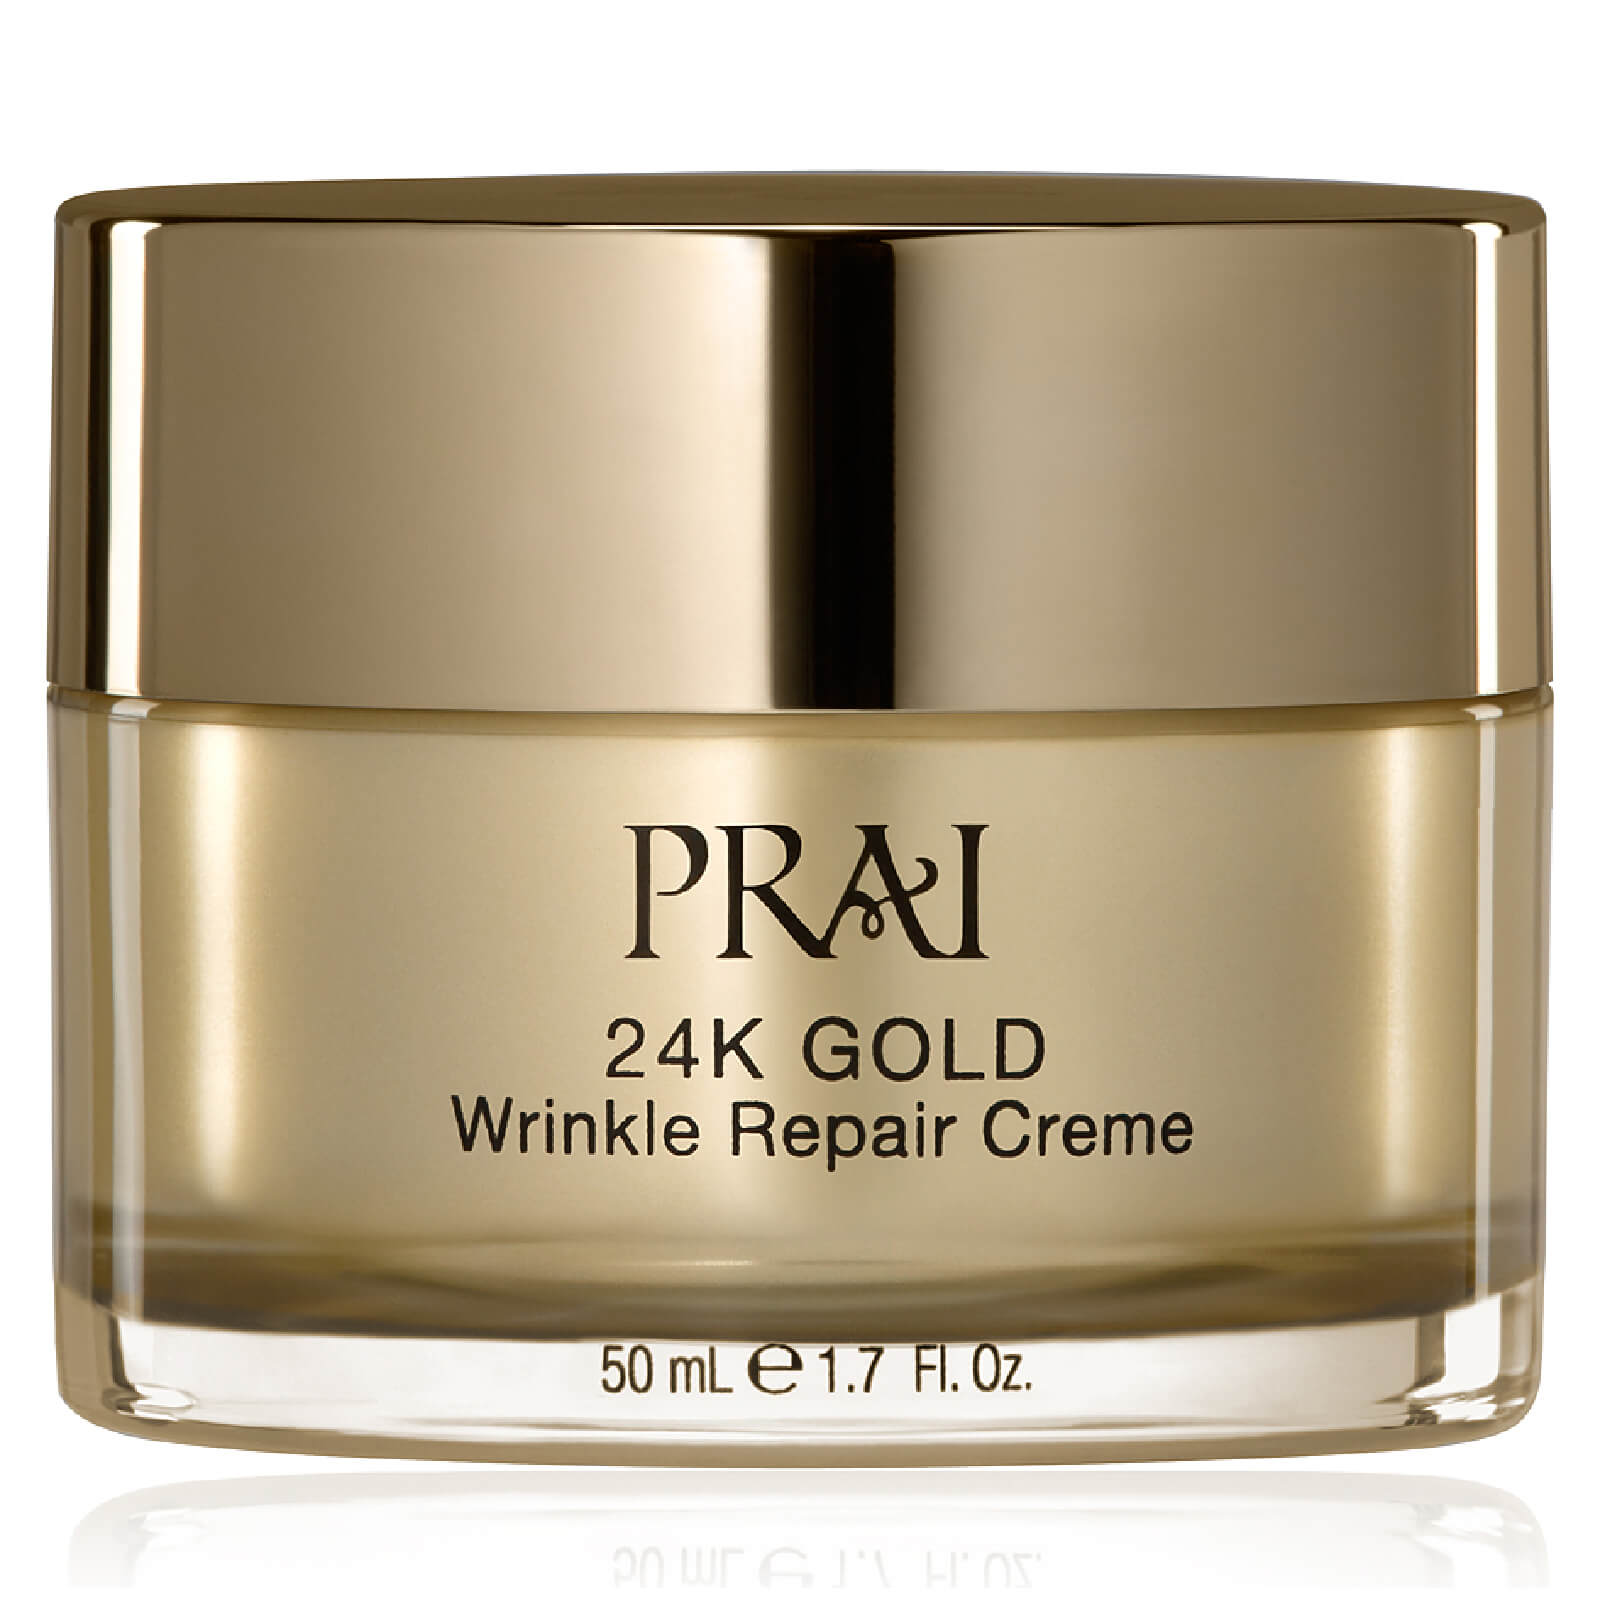 Купить Восстанавливающий крем для лица против морщин с частицами 24-каратного золота PRAI 24K GOLD Wrinkle Repair Crème 50мл